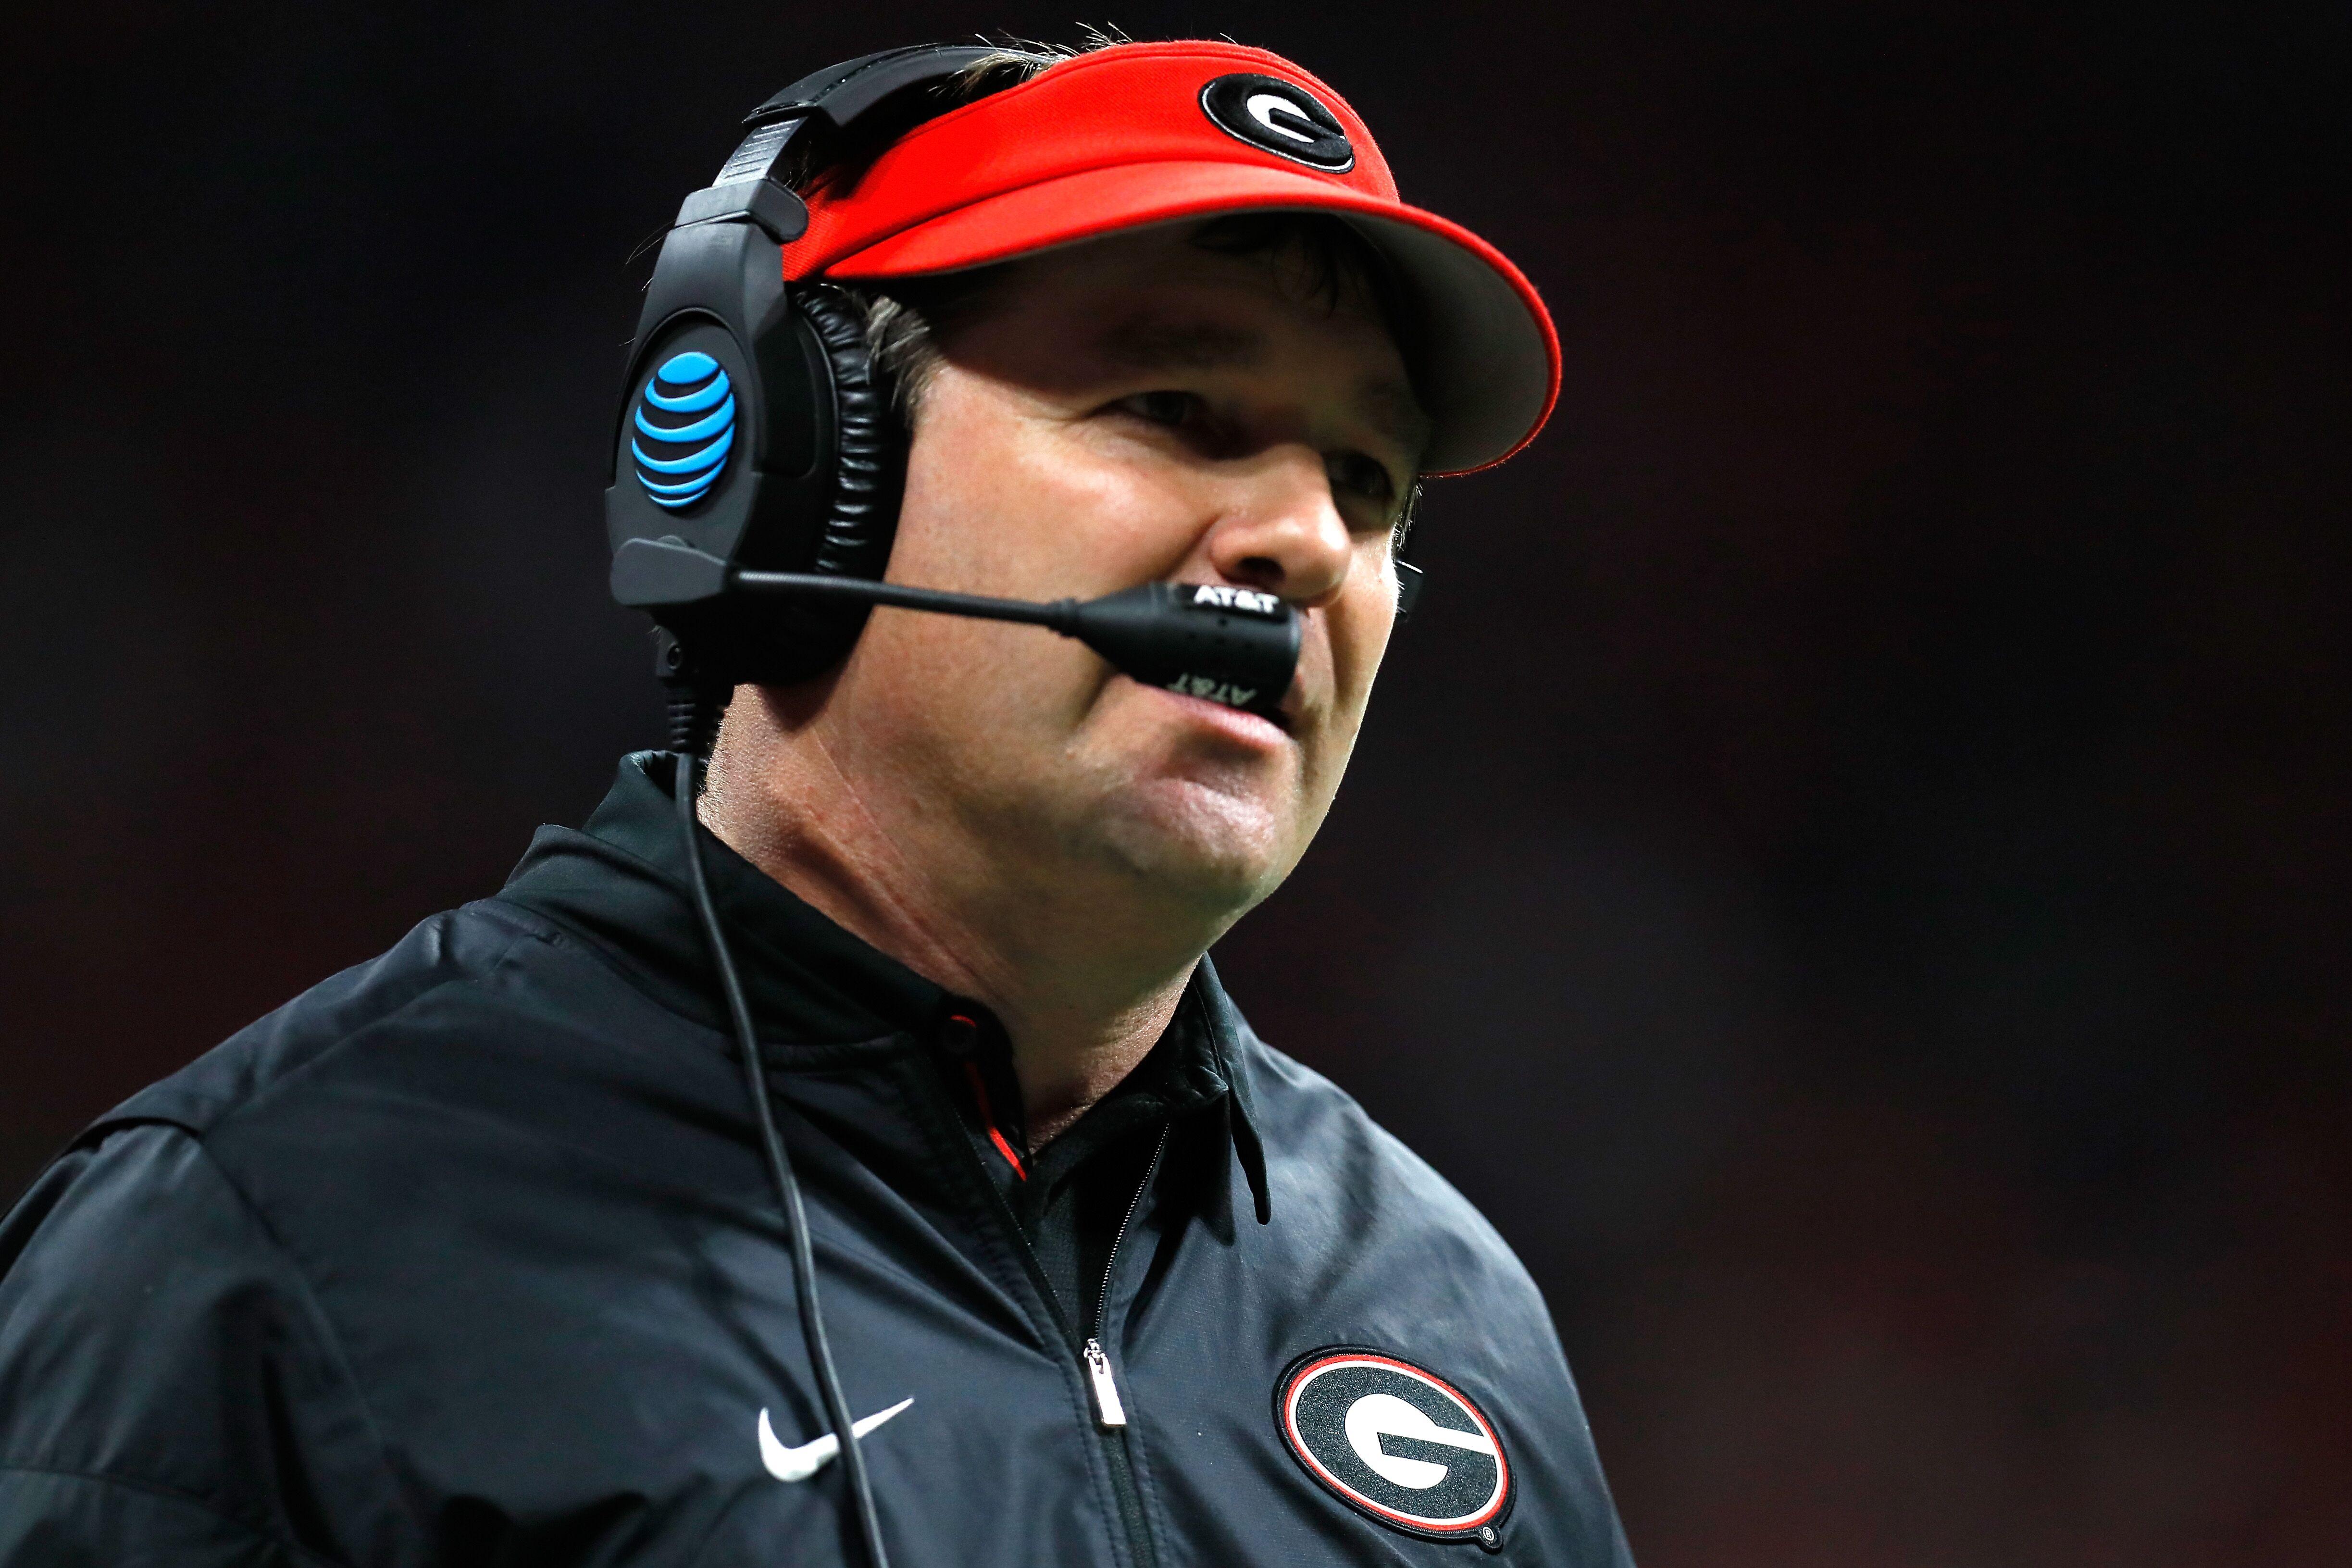 Georgia Football: Bulldogs aren't going anywhere anytime soon